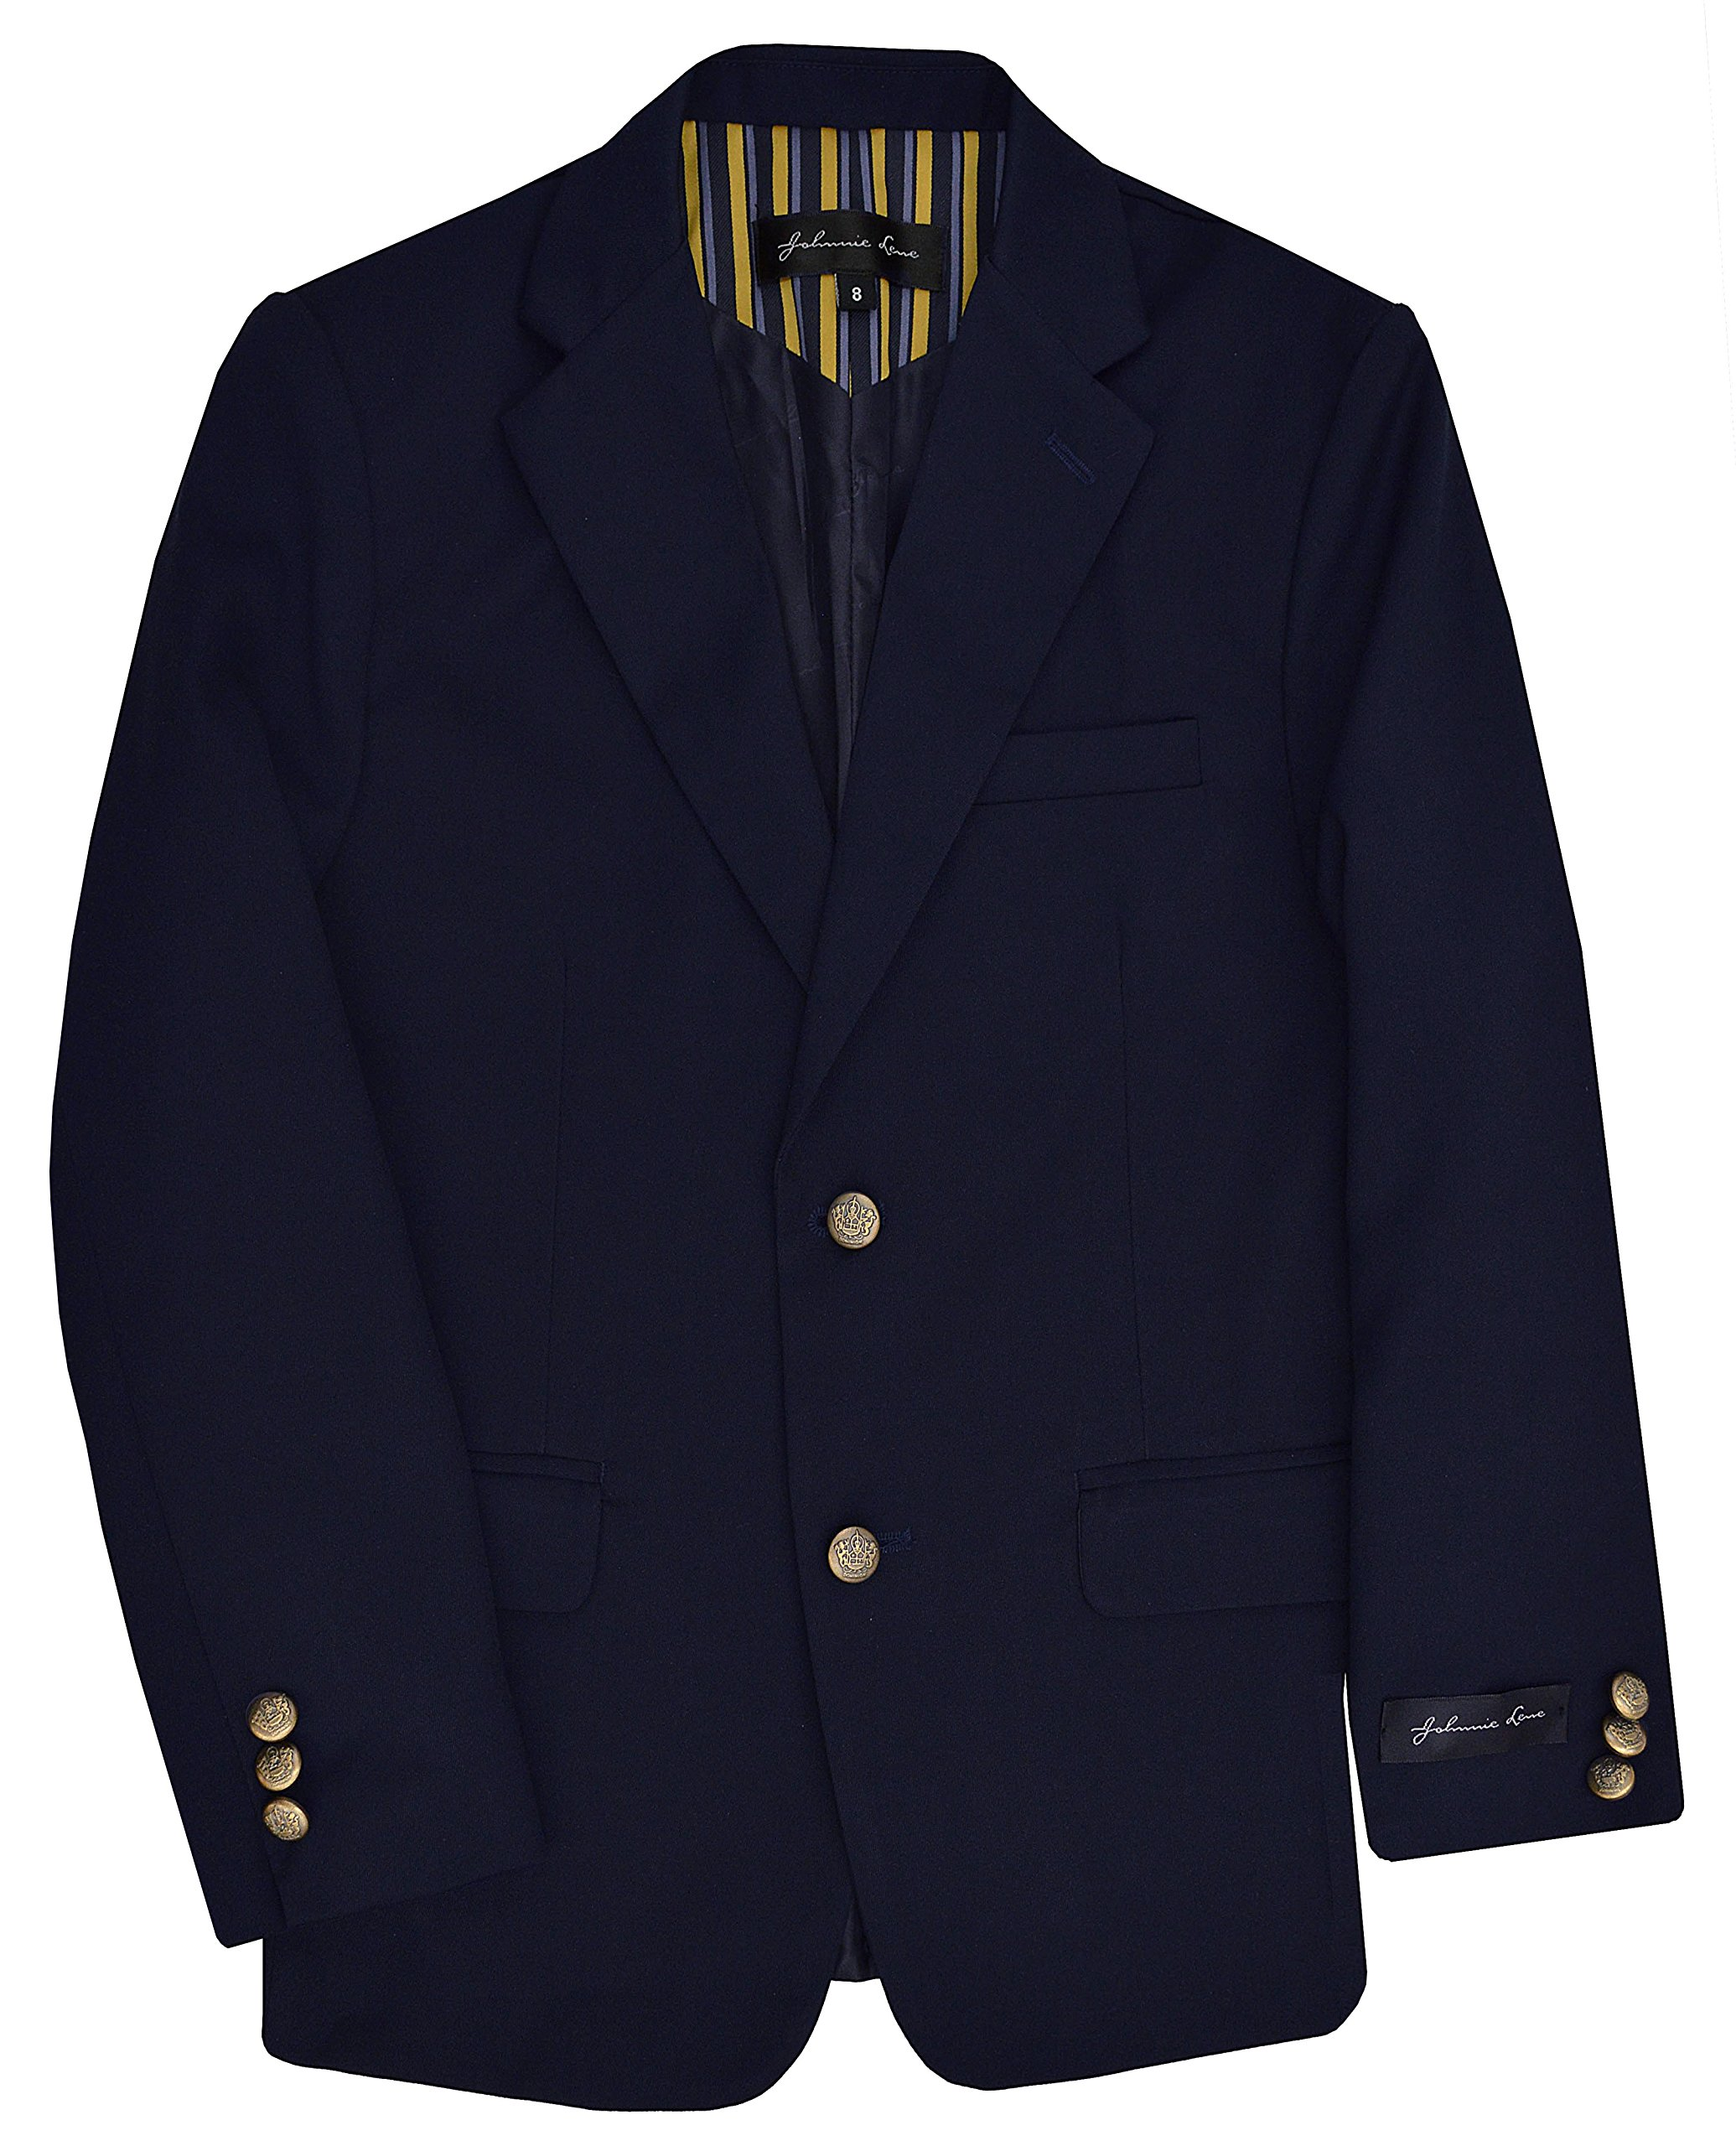 Dress Up Boys' Navy Blazer Jacket #JL30 (14, Lt. Navy)